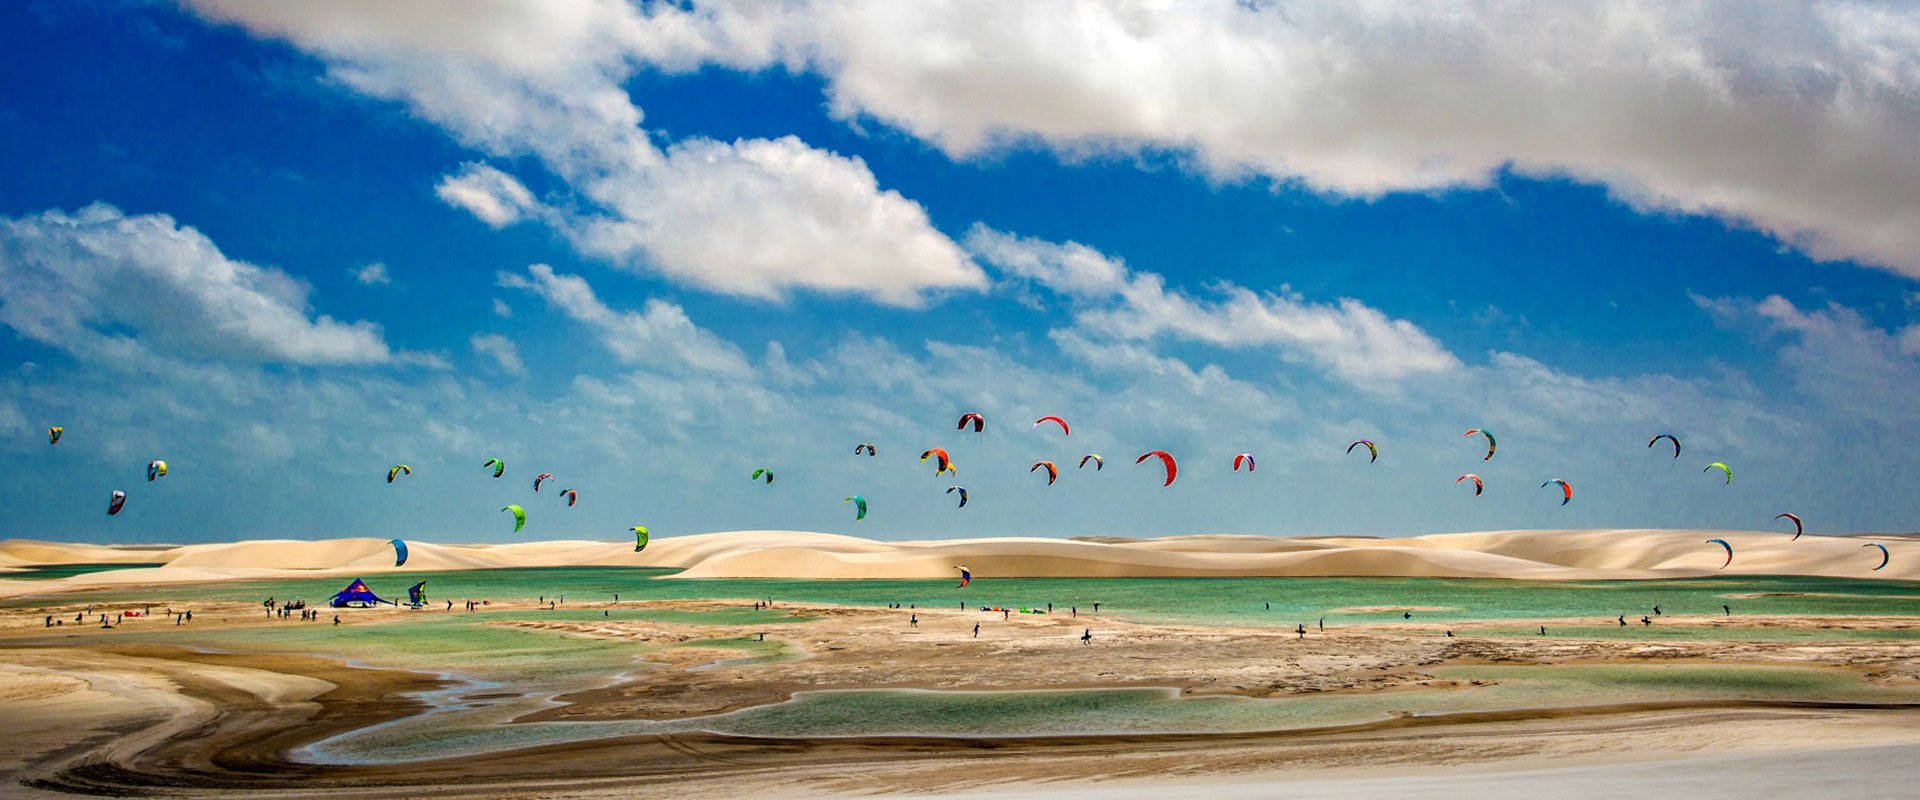 A group of people kitesurfing among the sand dunes of Lençóis Maranhenses